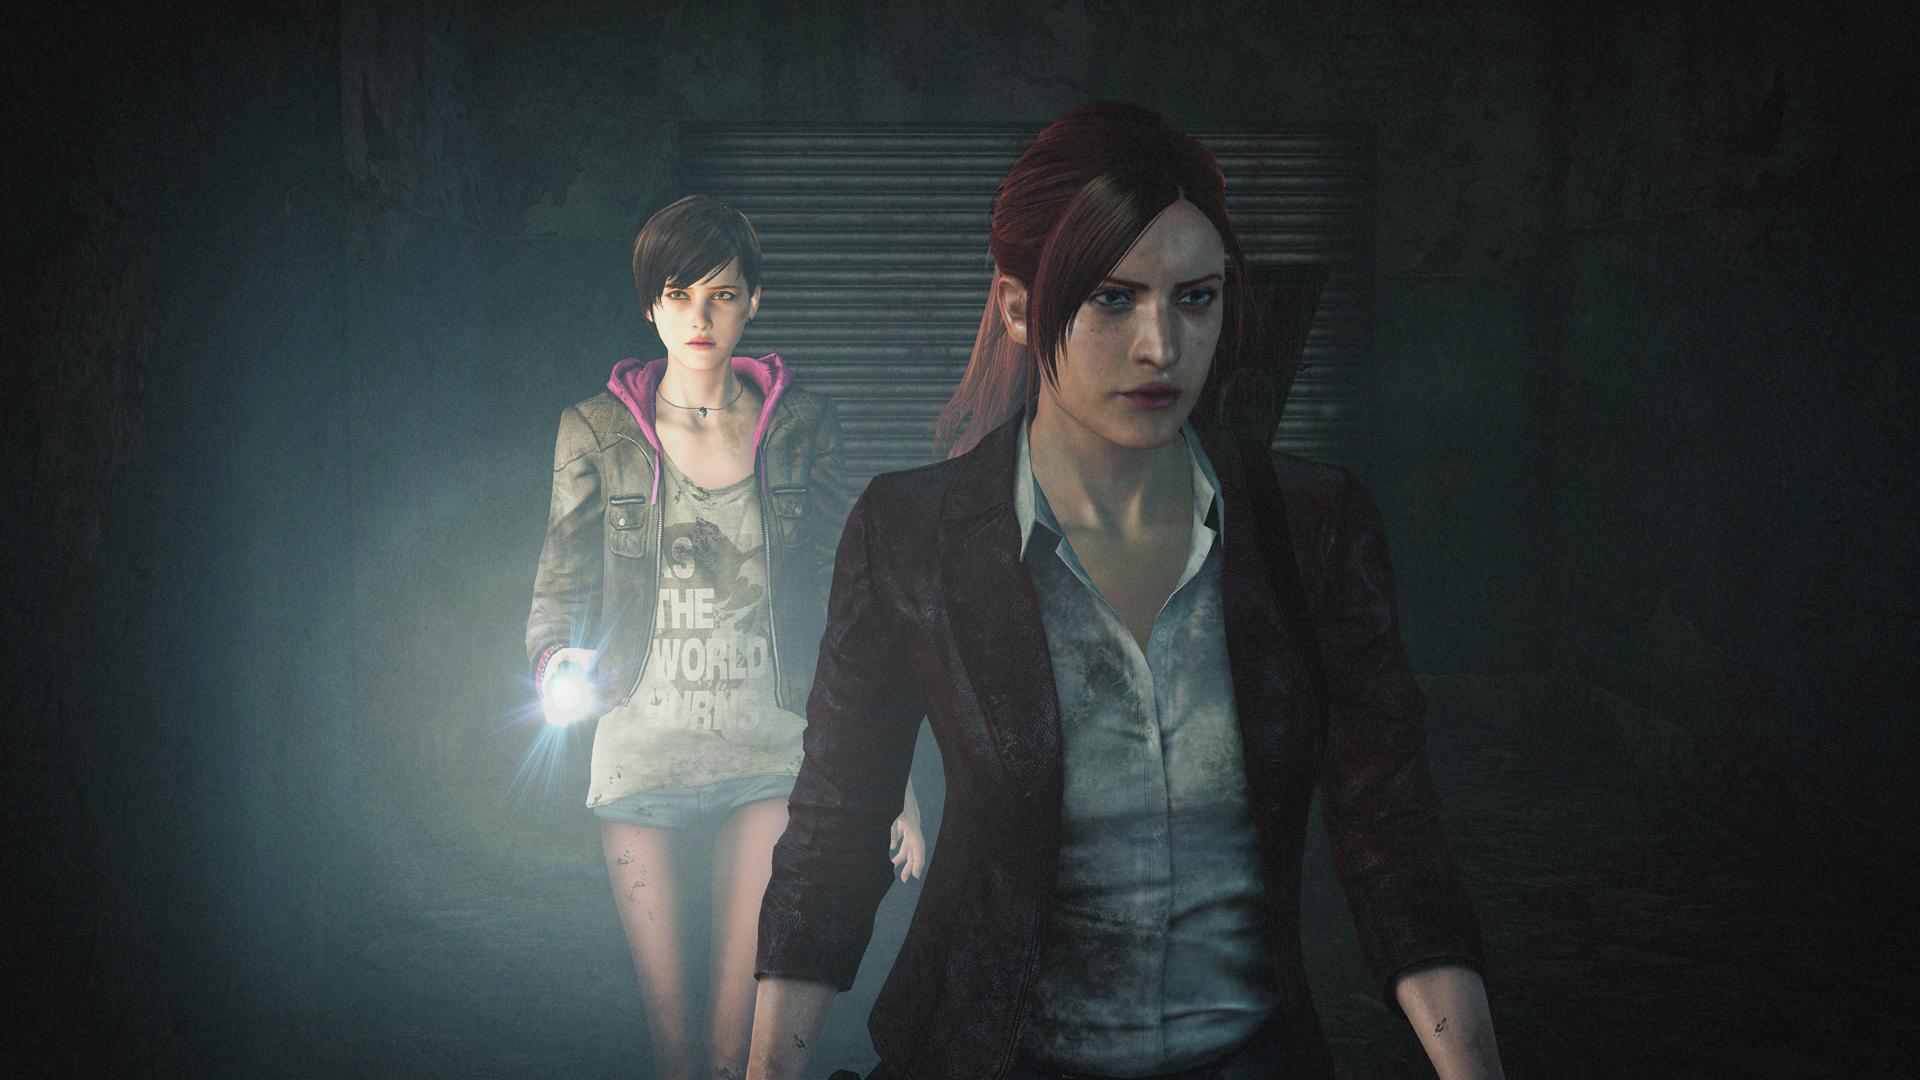 Reliable Resident Evil insider says to prep for Resident Evil Revelations 3 on Switch screenshot